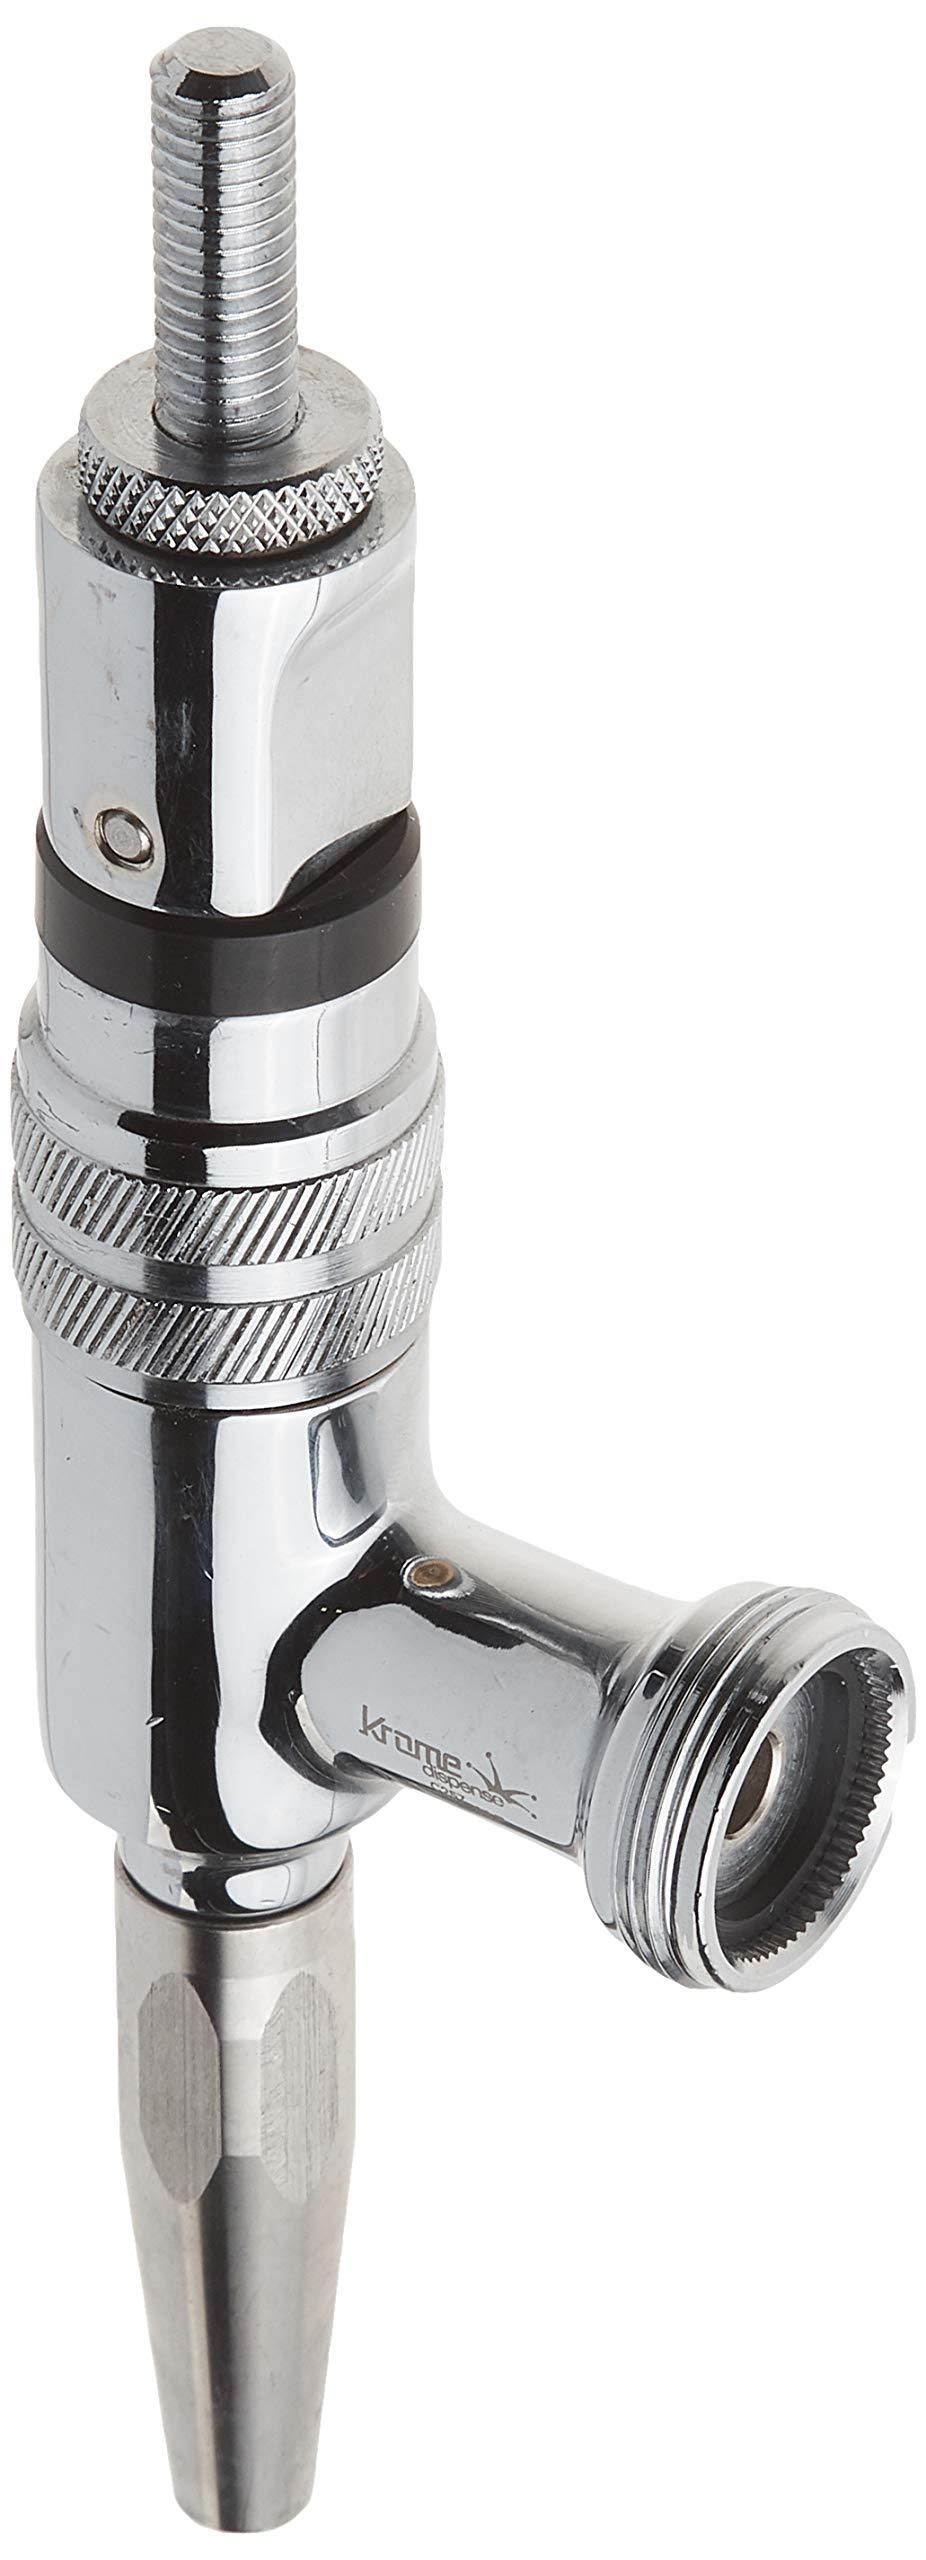 Krome Dispense C257 Stout Faucet, Chrome Plated Brass, 3/8''-16'' UNC Thread, 60 Teeth Connection